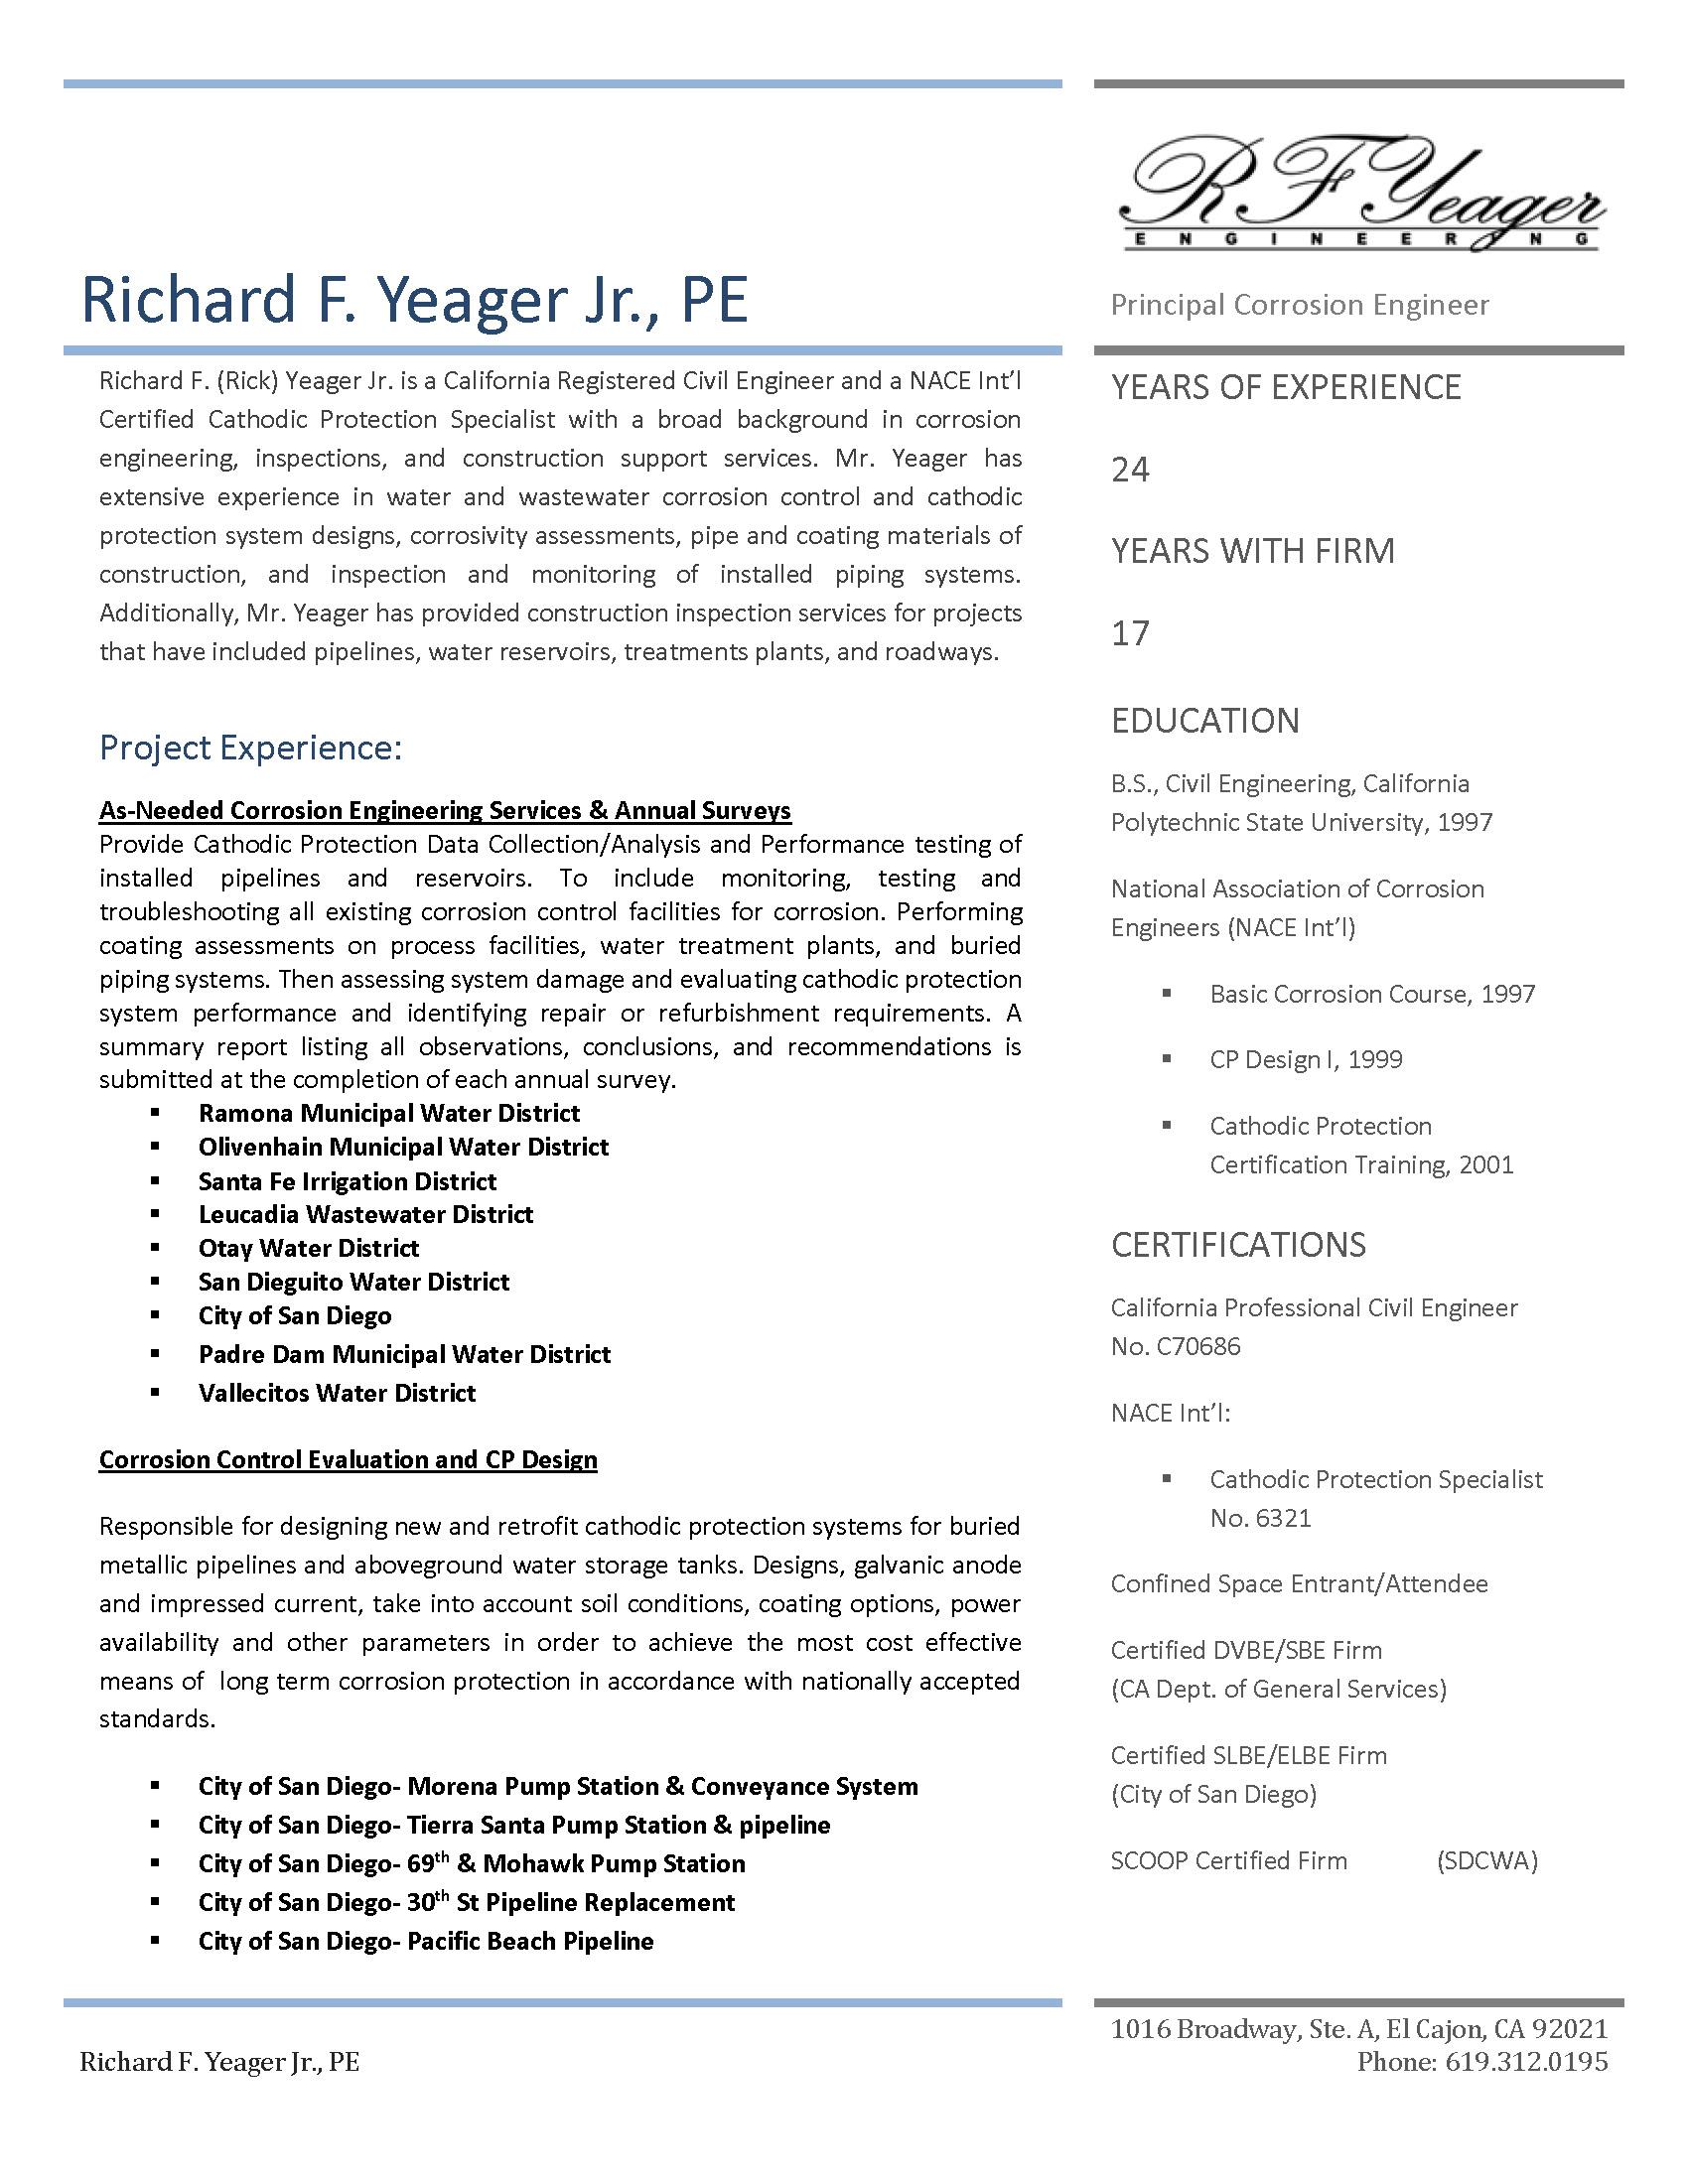 RF Yeager Resume